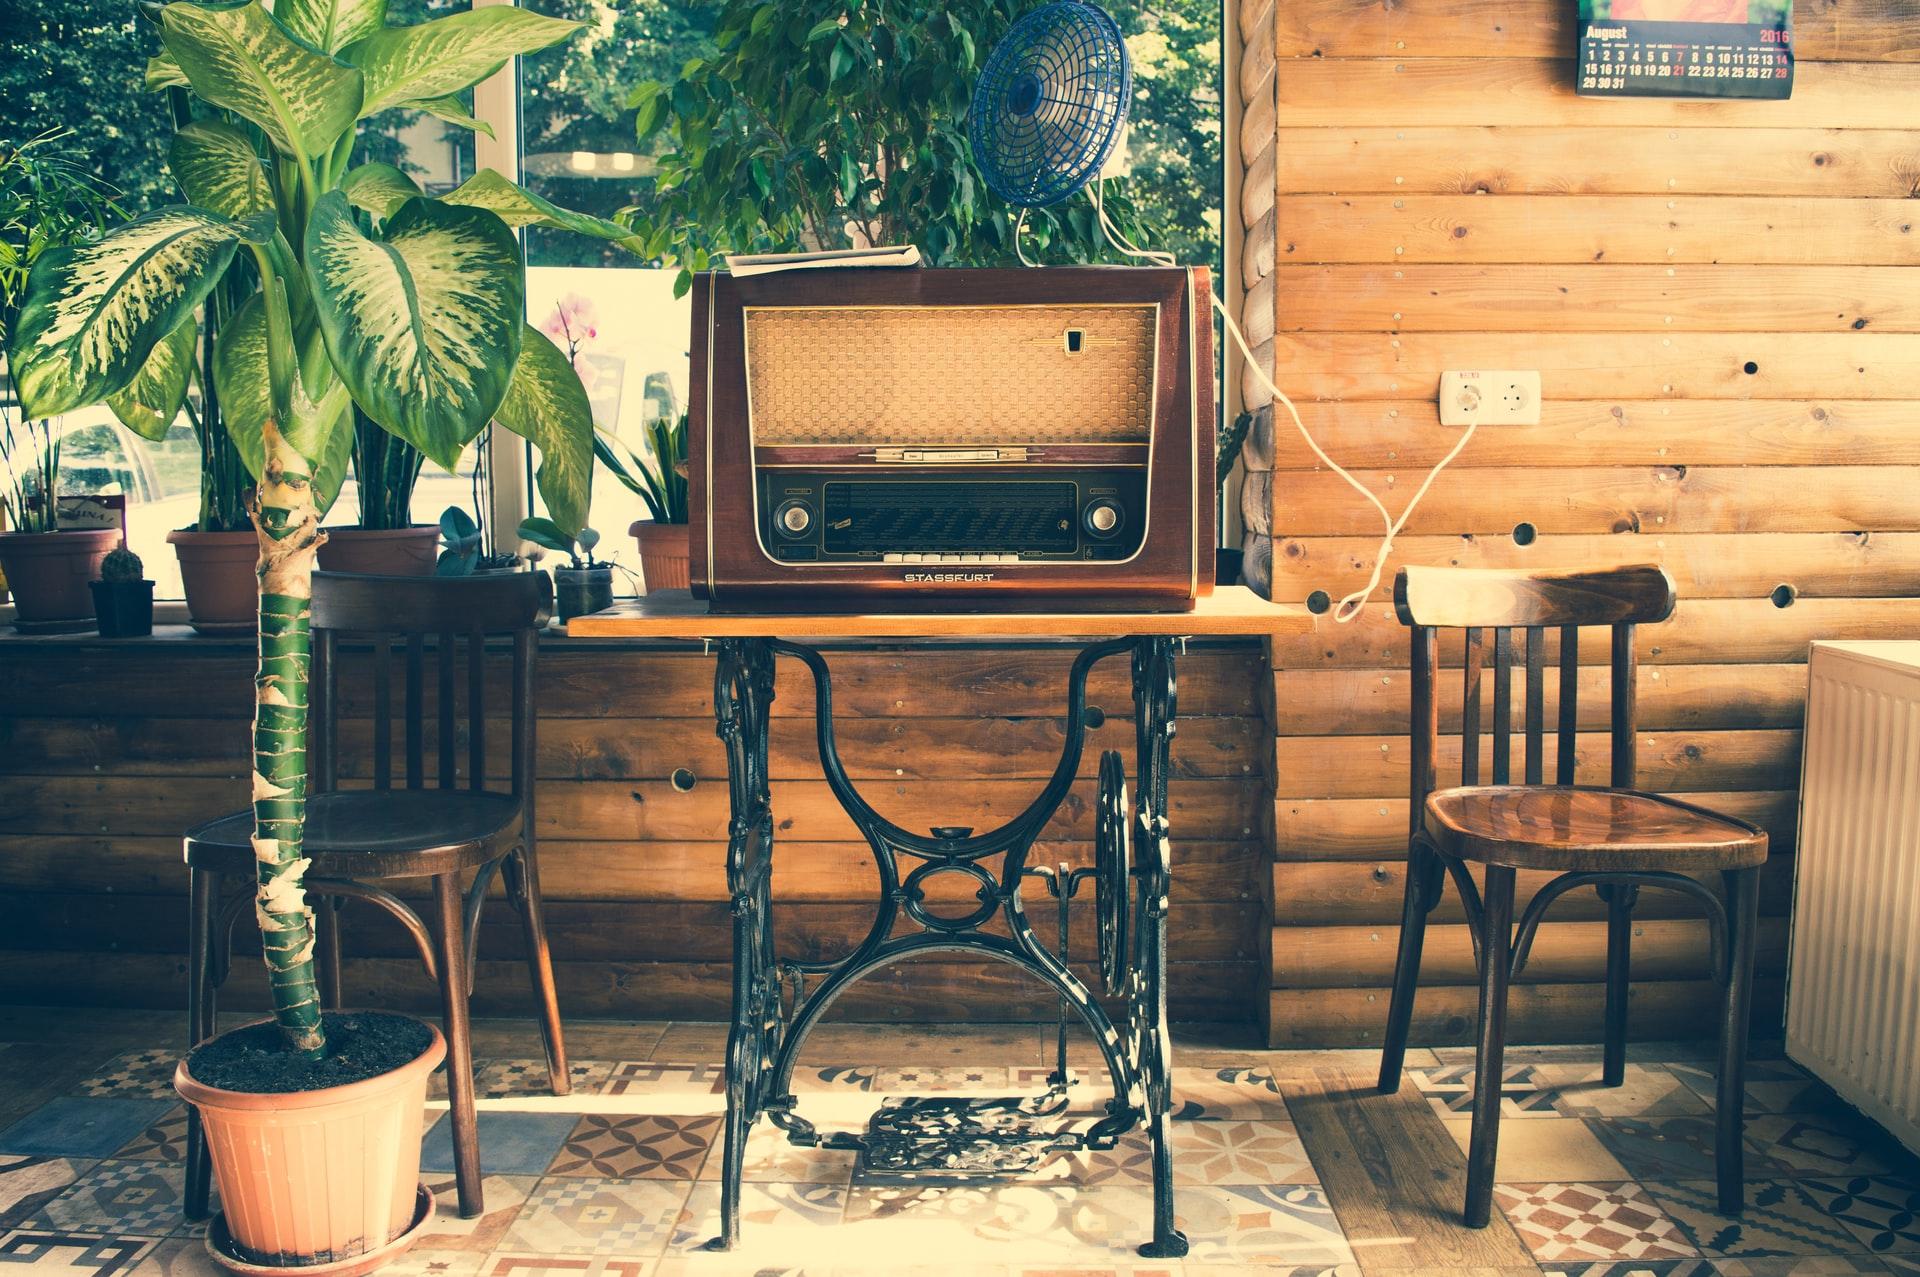 Televisão vintage (Fonte - Unsplash)